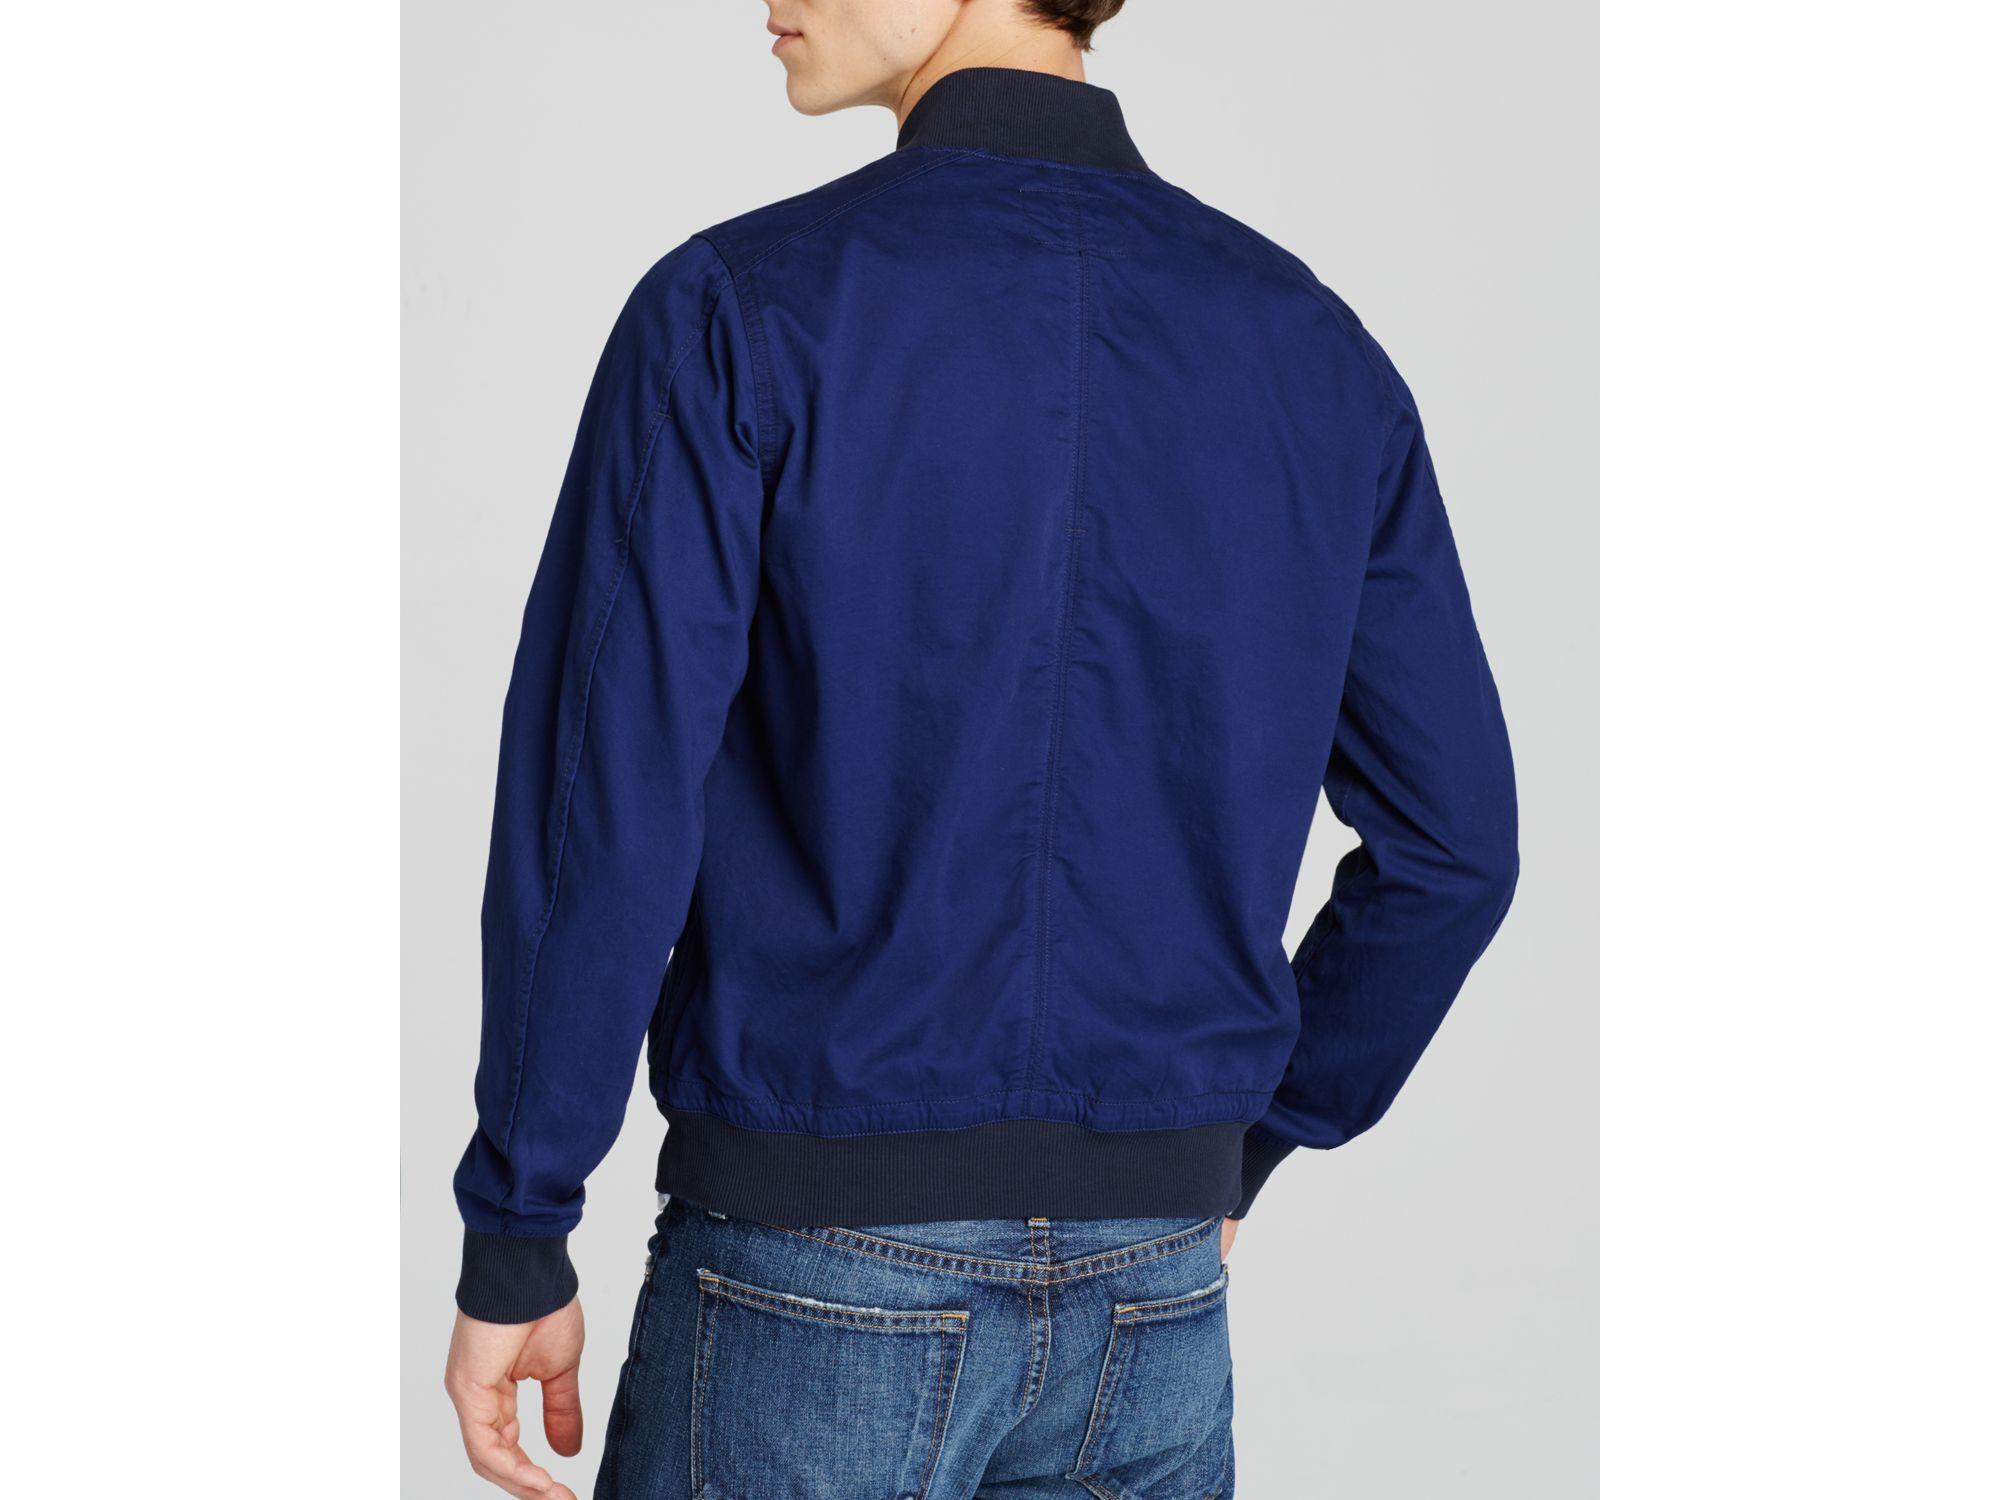 g star raw shattor bomber jacket in blue for men lyst. Black Bedroom Furniture Sets. Home Design Ideas